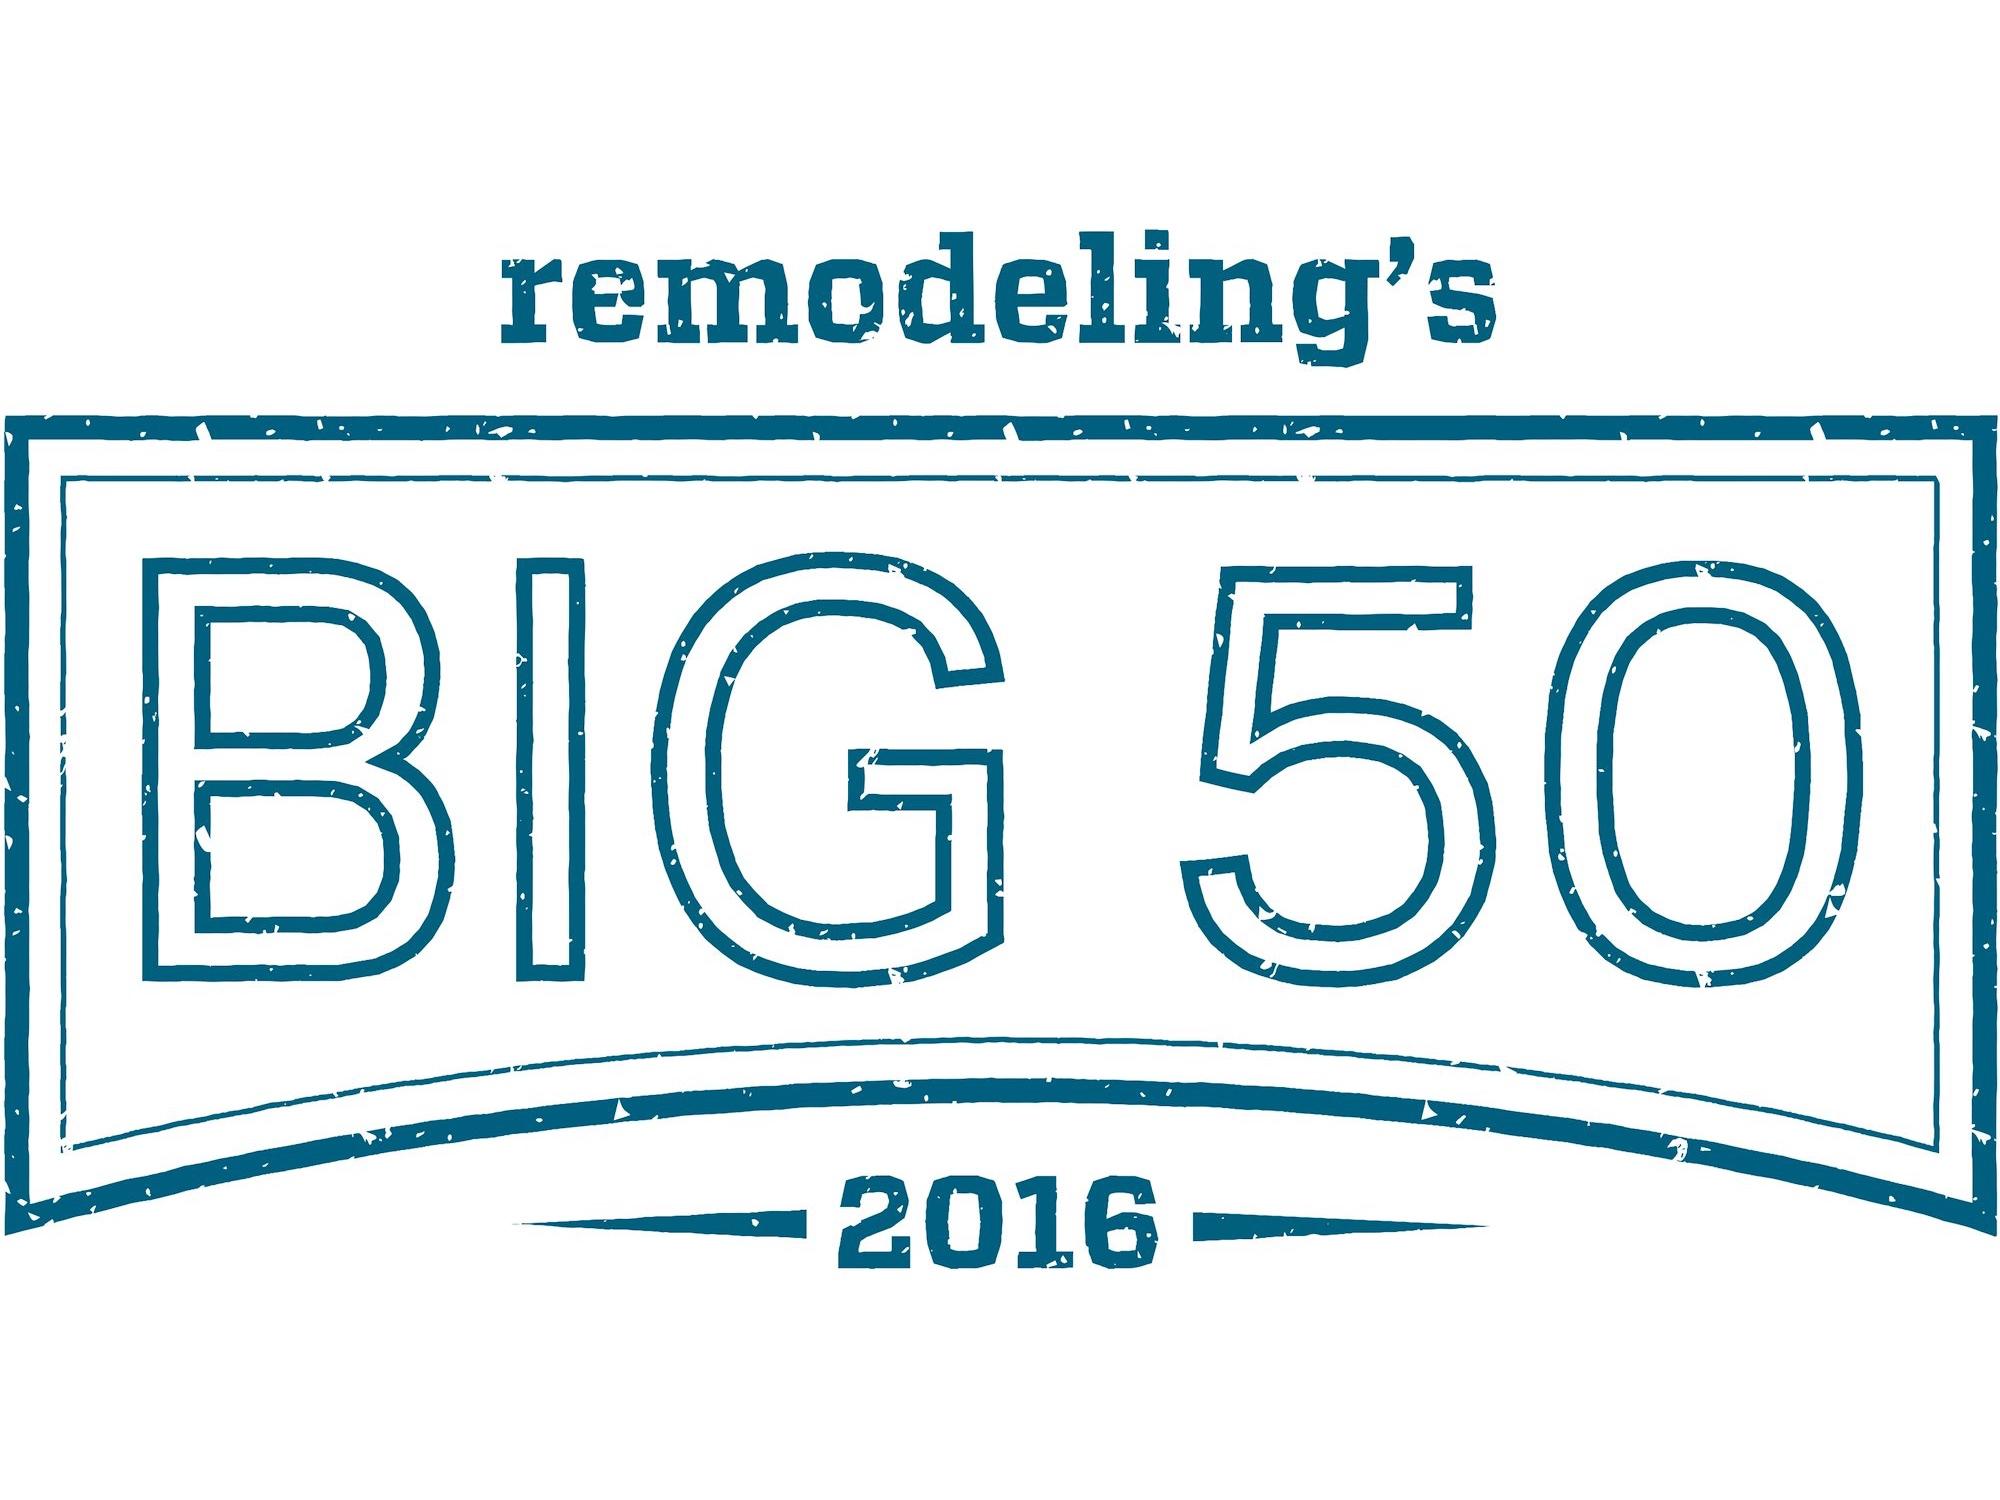 The 2016 big50 hanley wood leadership management for Hanley wood logo